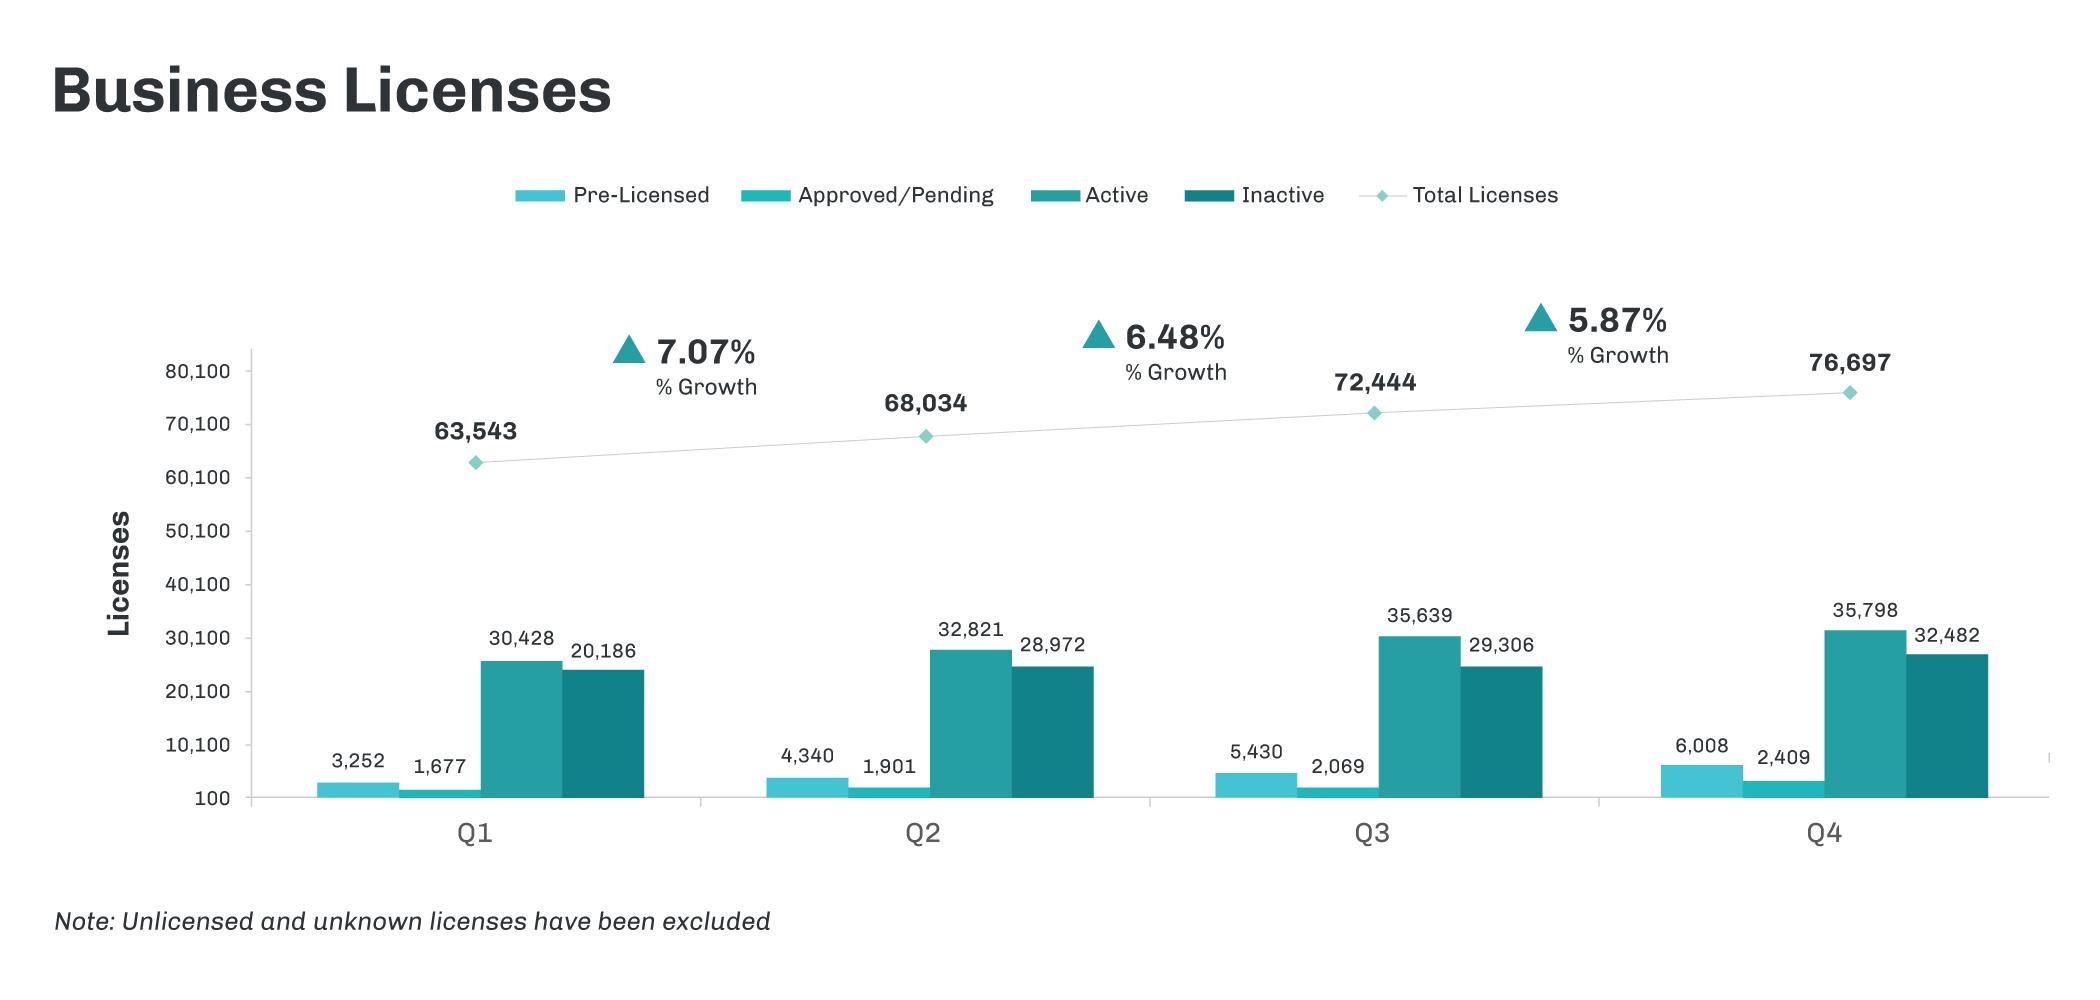 CRB_NewsLetter_Graphs_BusinessLicenseCounts